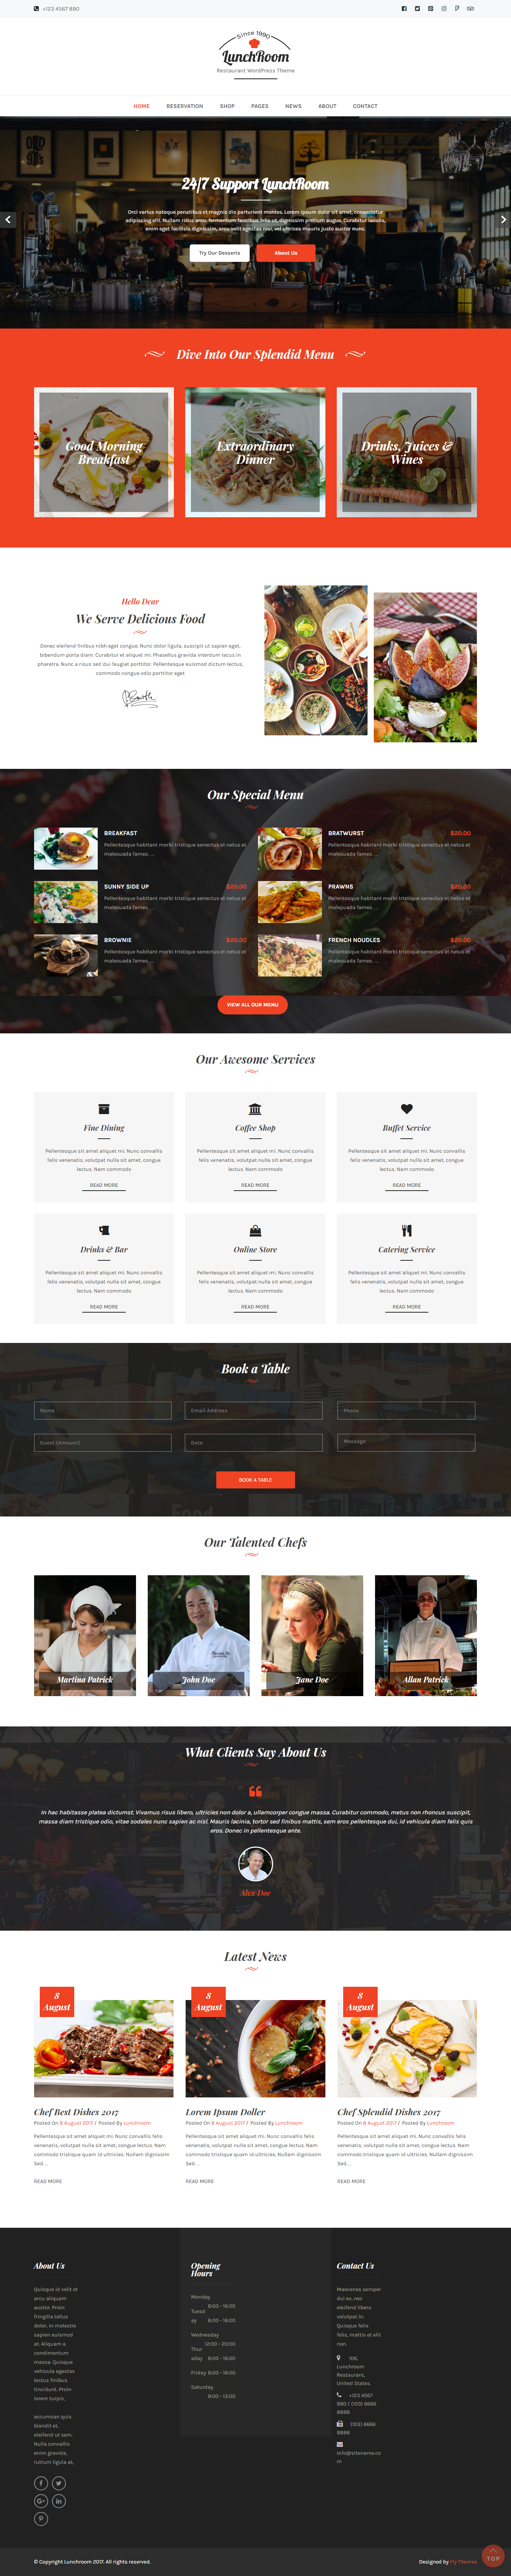 lunchroom best free bar pub wordpress theme - 10+ Best Free Bar and Pub WordPress Themes